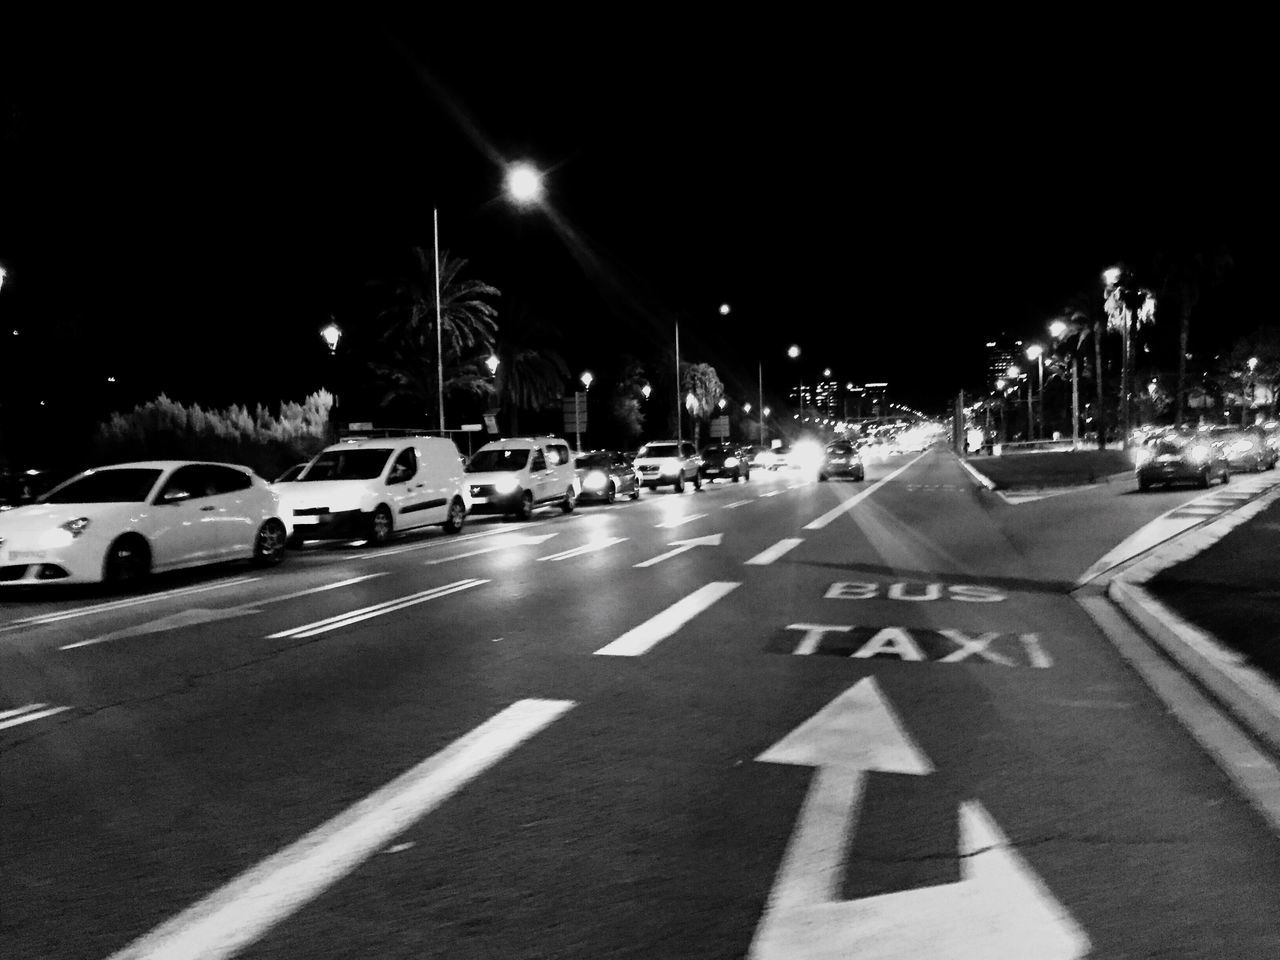 Night crossing La Diagonal Illuminated Transportation Night Car Traffic Street Light Sky Outdoors Road No People Barcelona Diagonal Avinguda Diagonal Zona Universitaria